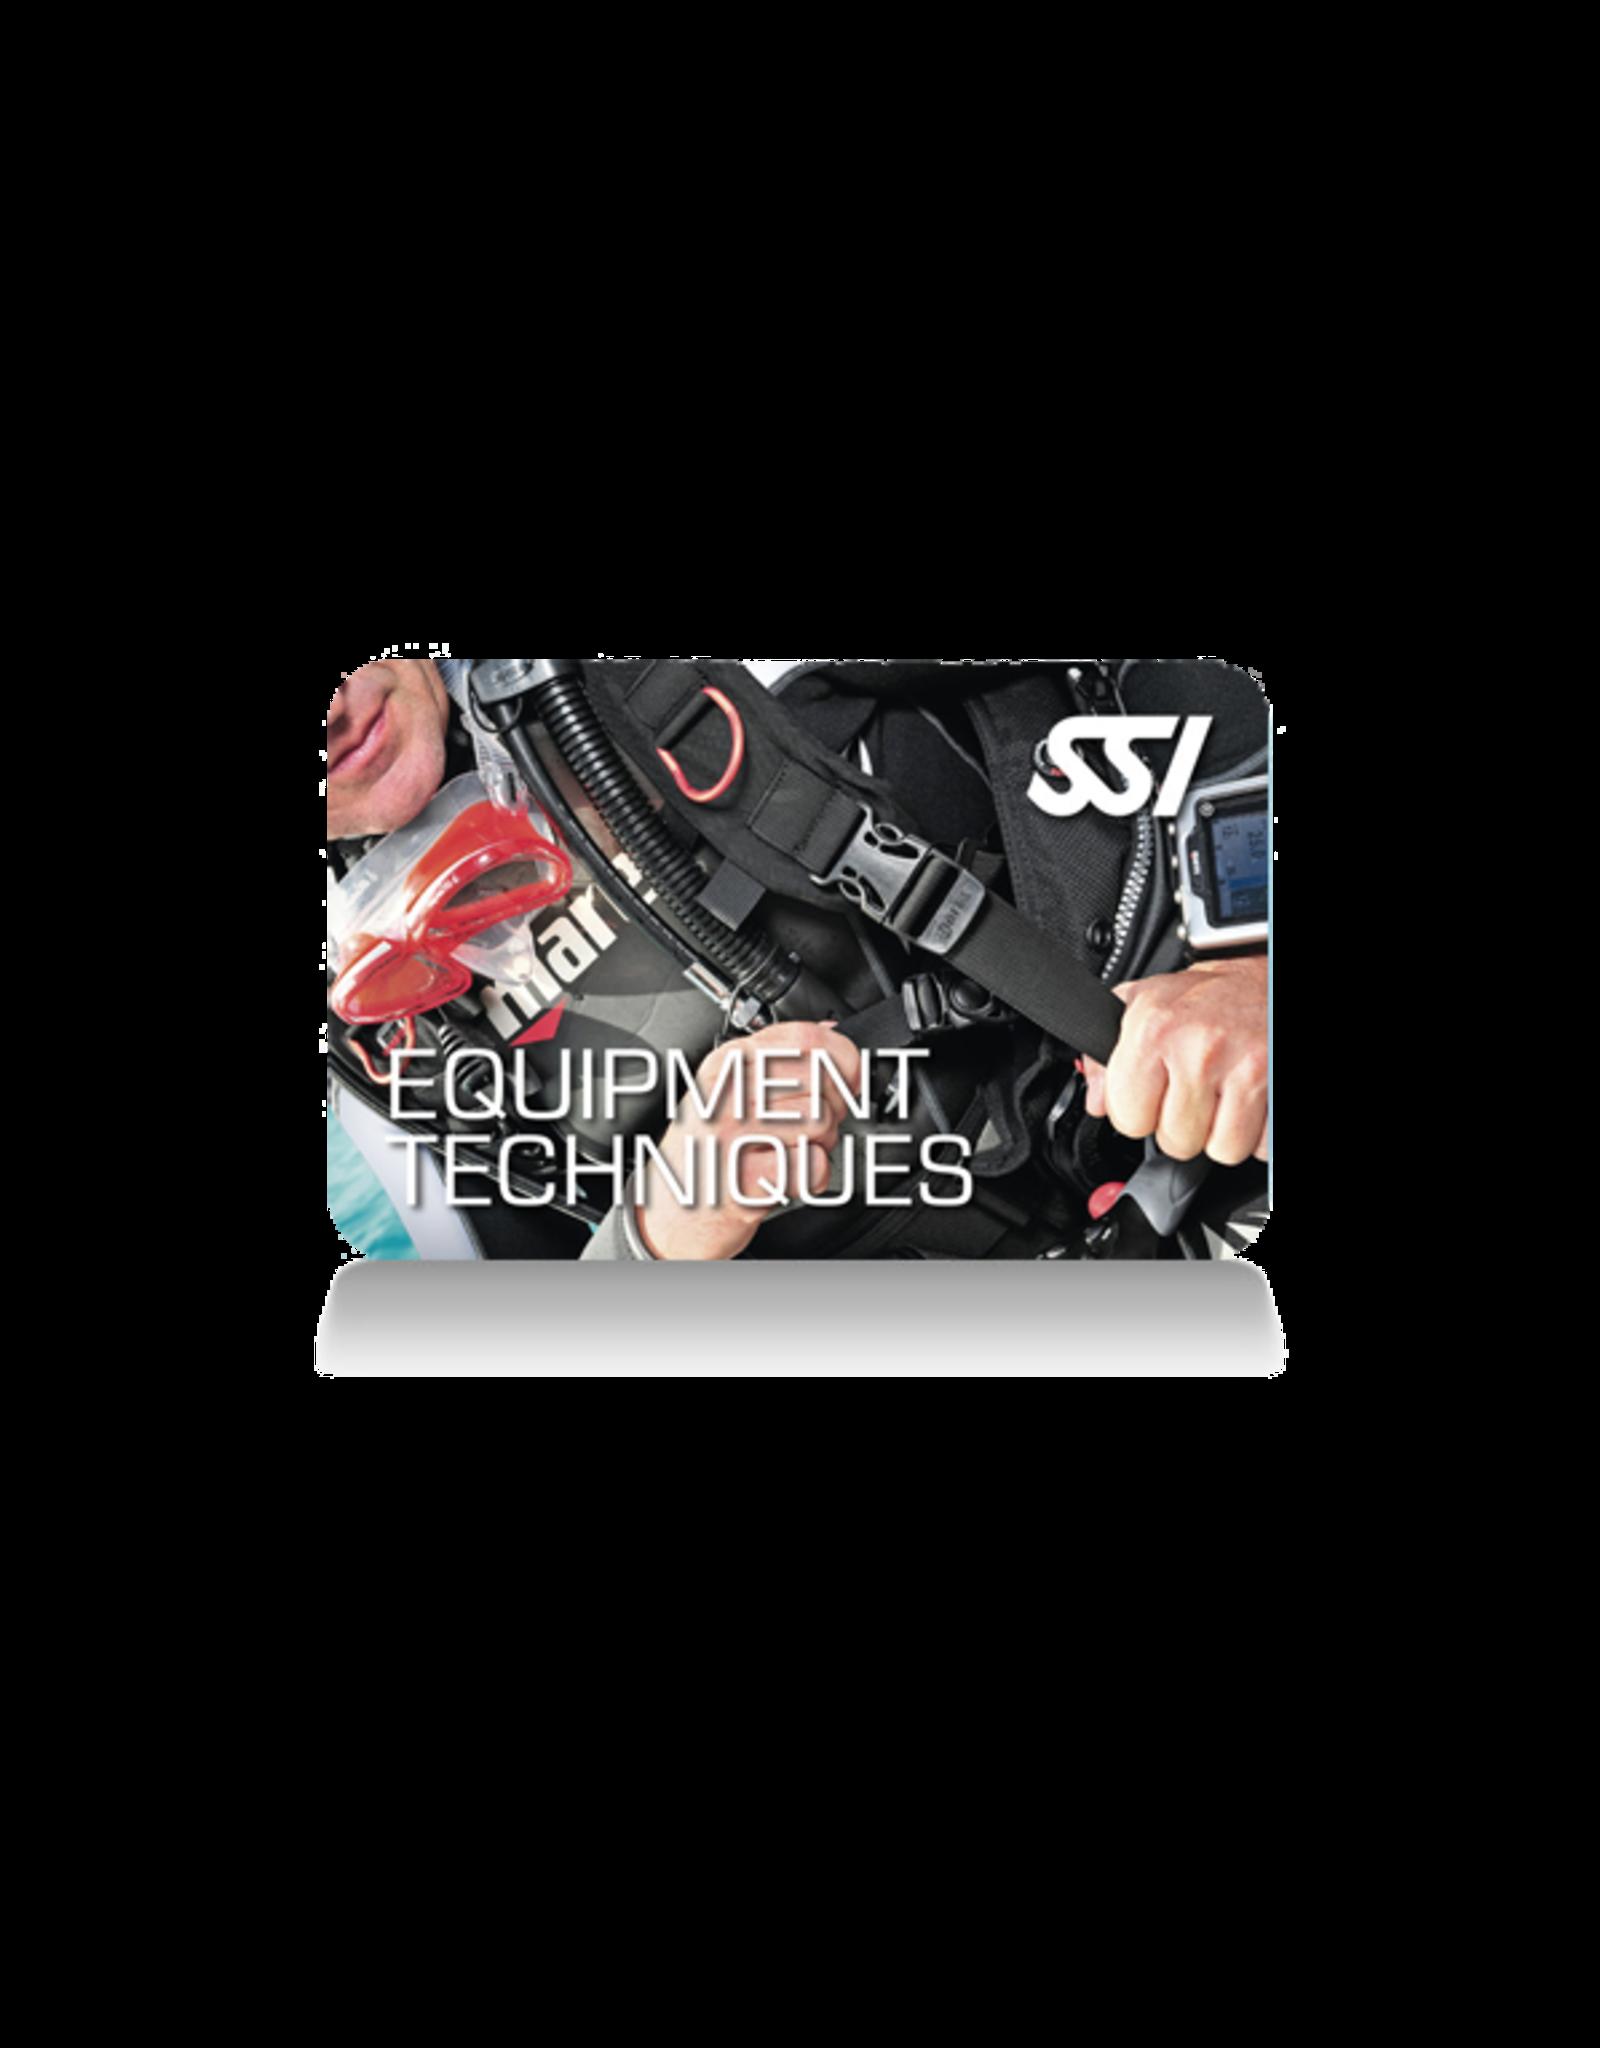 SSI SSI Equipment Techniques Specialty